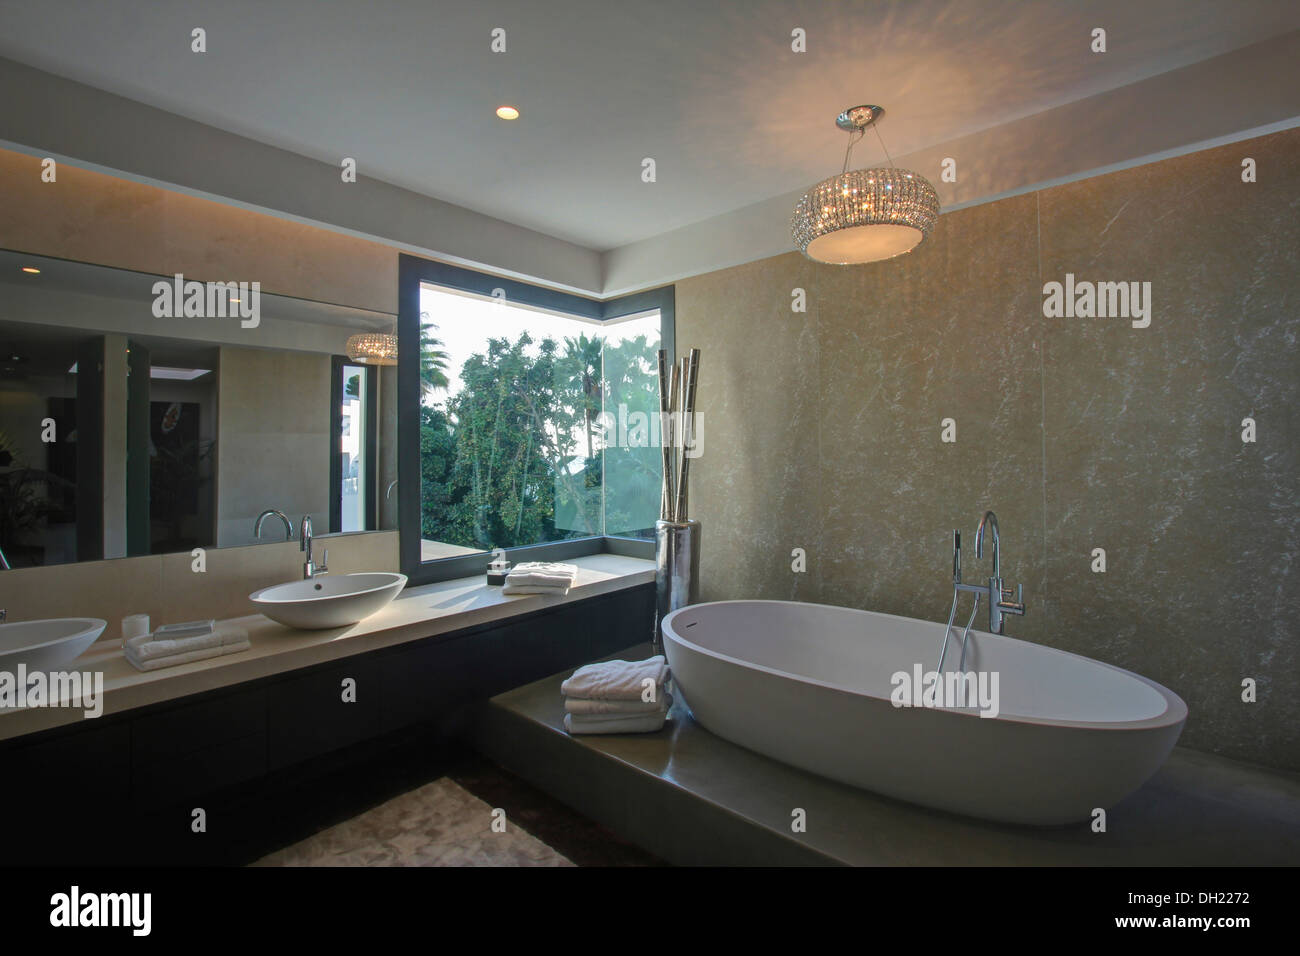 Glass Light Above Raised Oval Bath In Modern Marble Spanish Bathroom With  Bowl Basins On Vanity